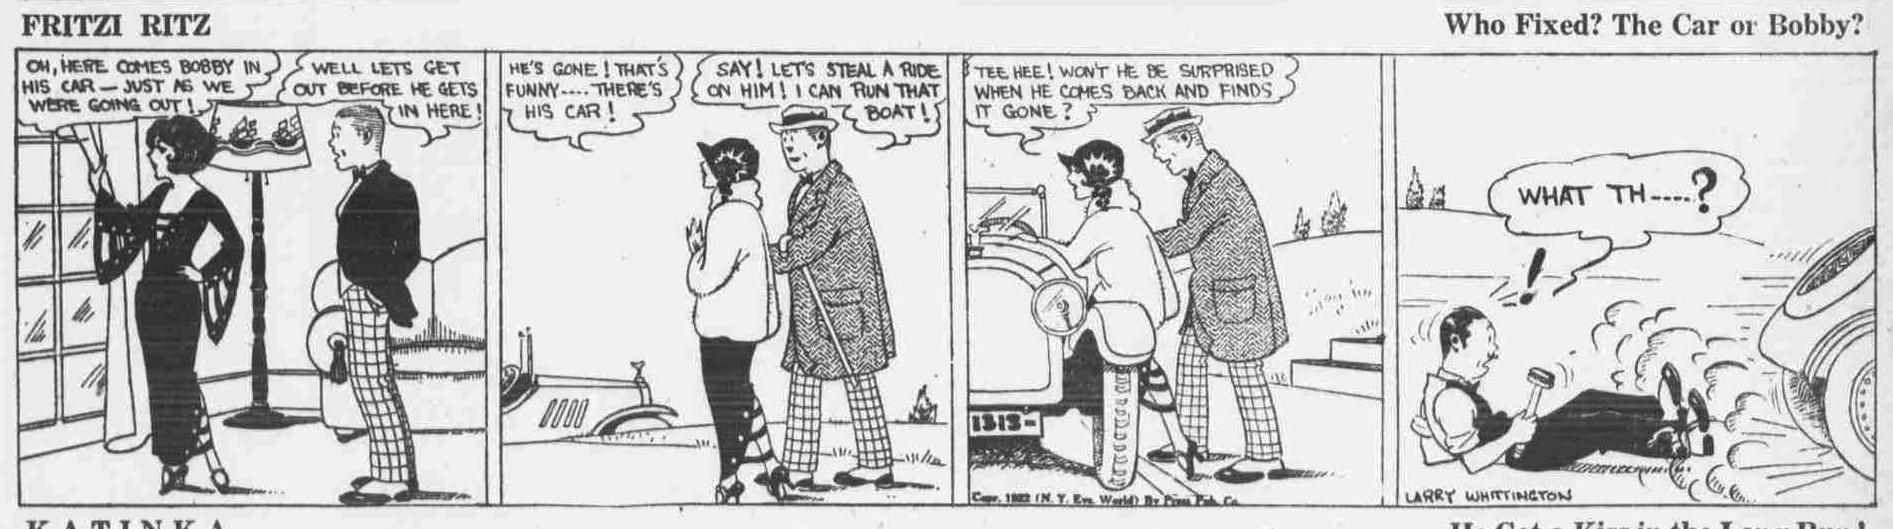 Dec. 2, 1922